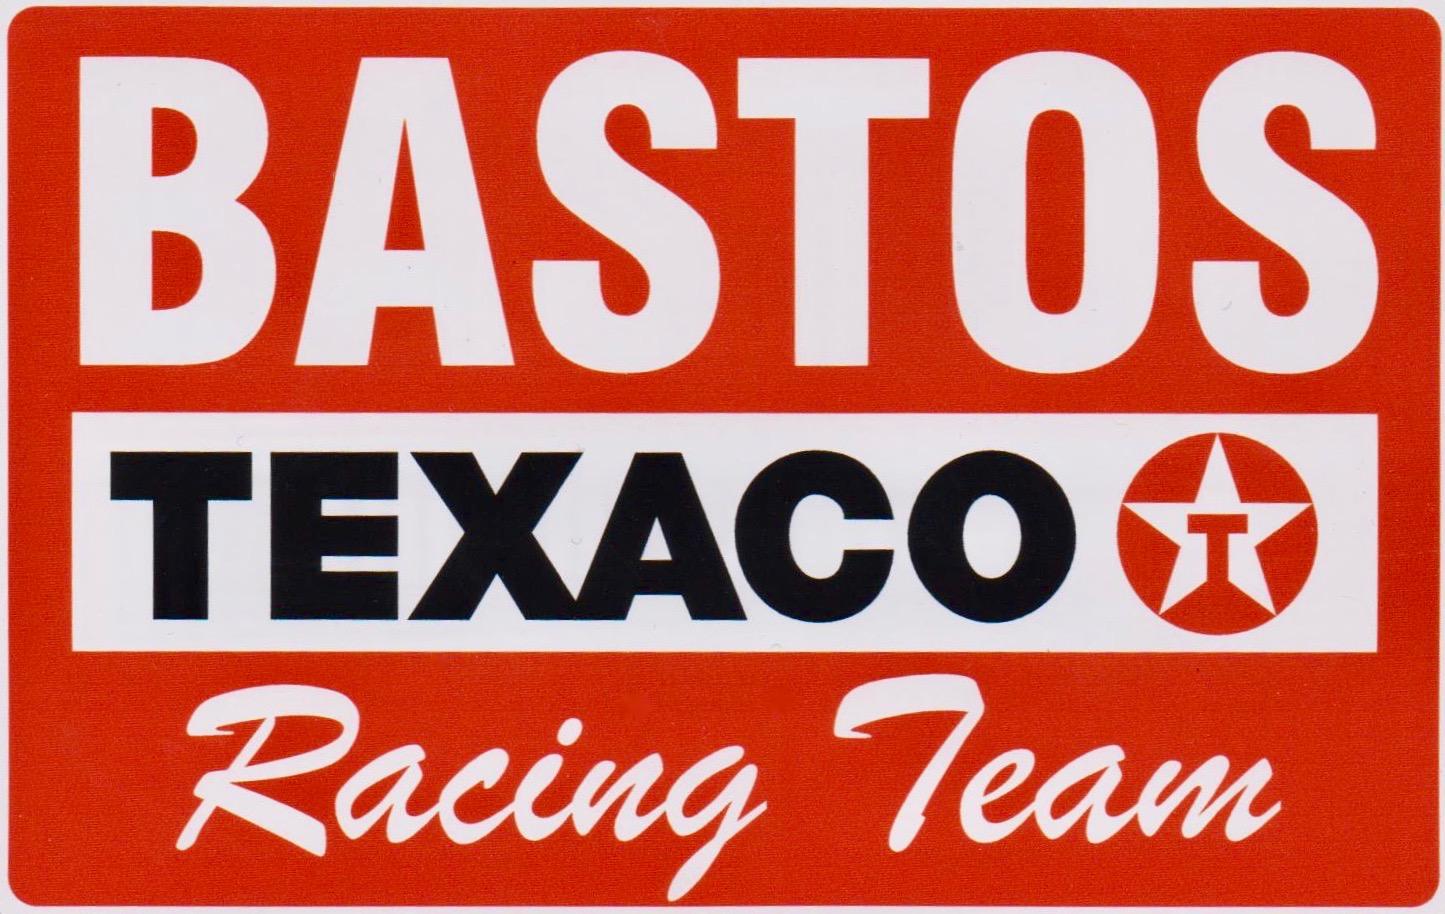 Texaco Bastos Racing Team Sticker